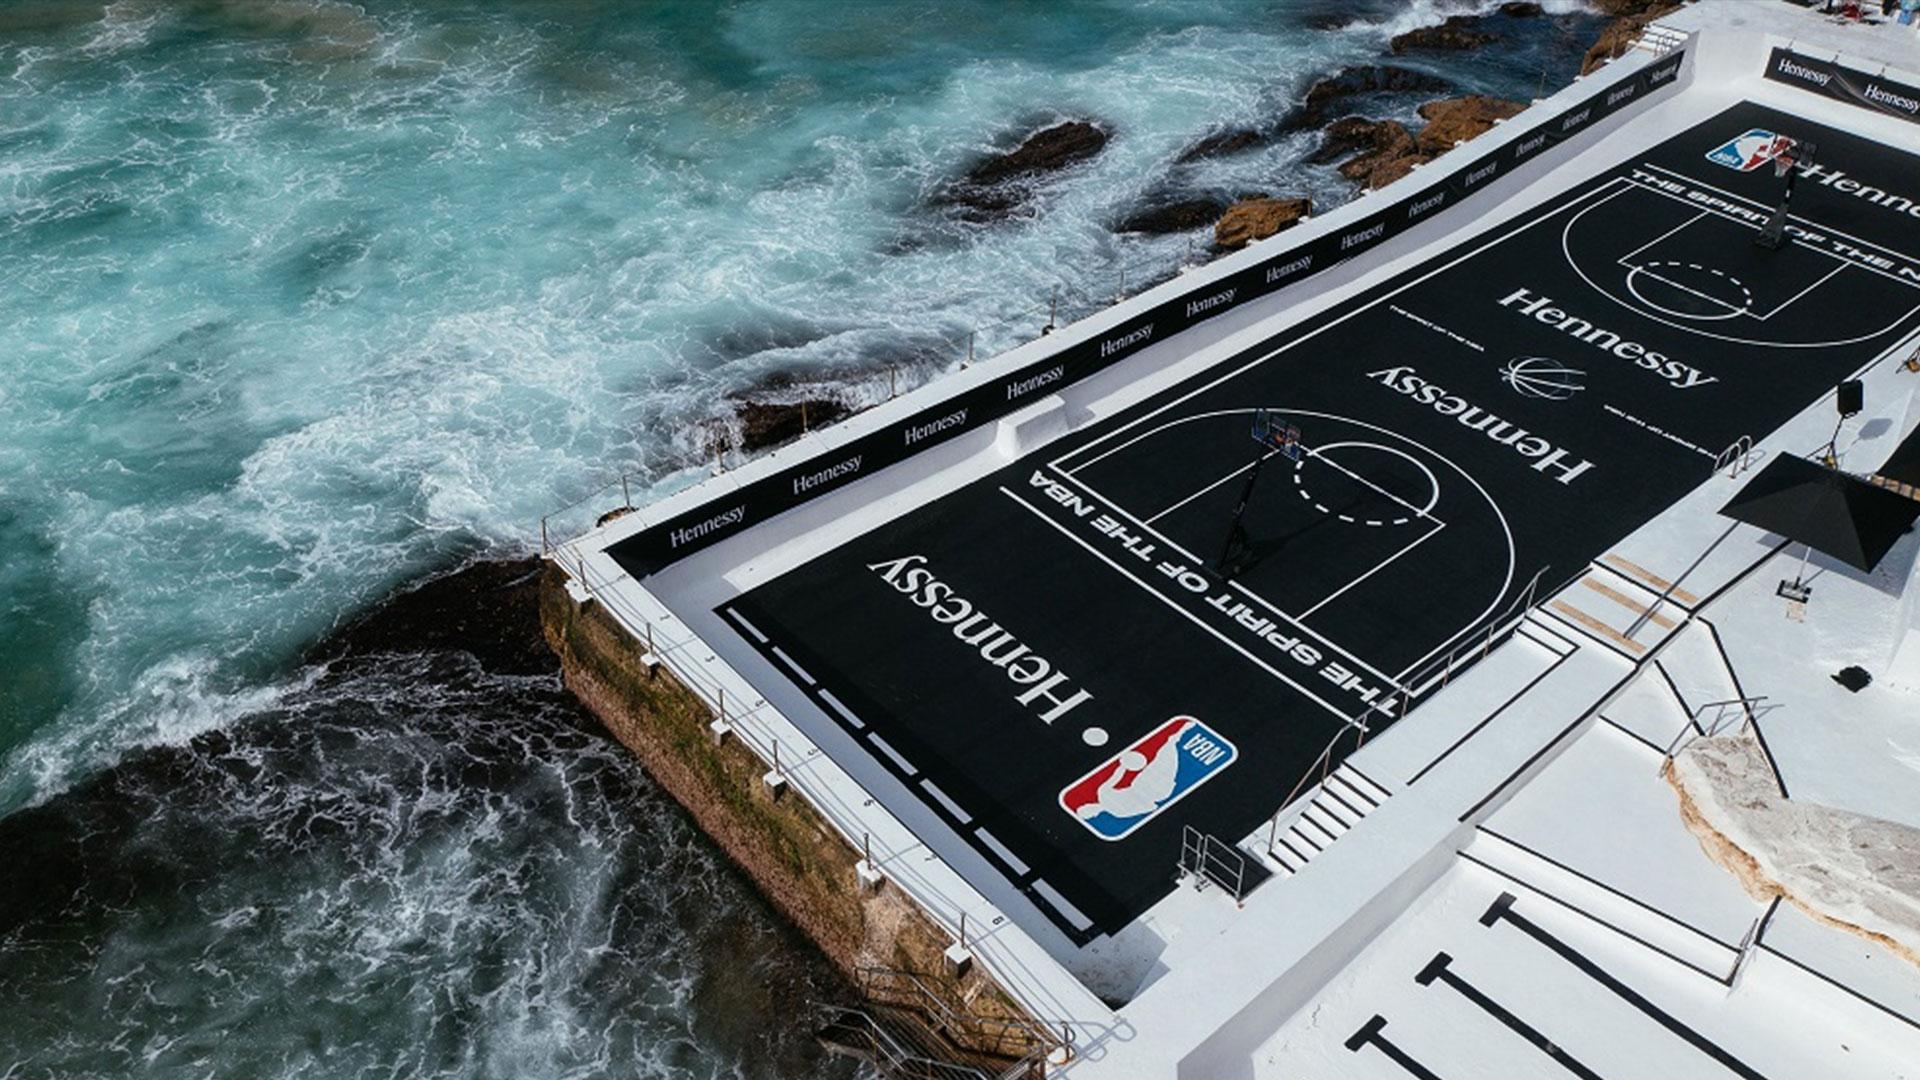 Hennessy Hero image of Bondi Iceberg's pool transformed into a basketball court